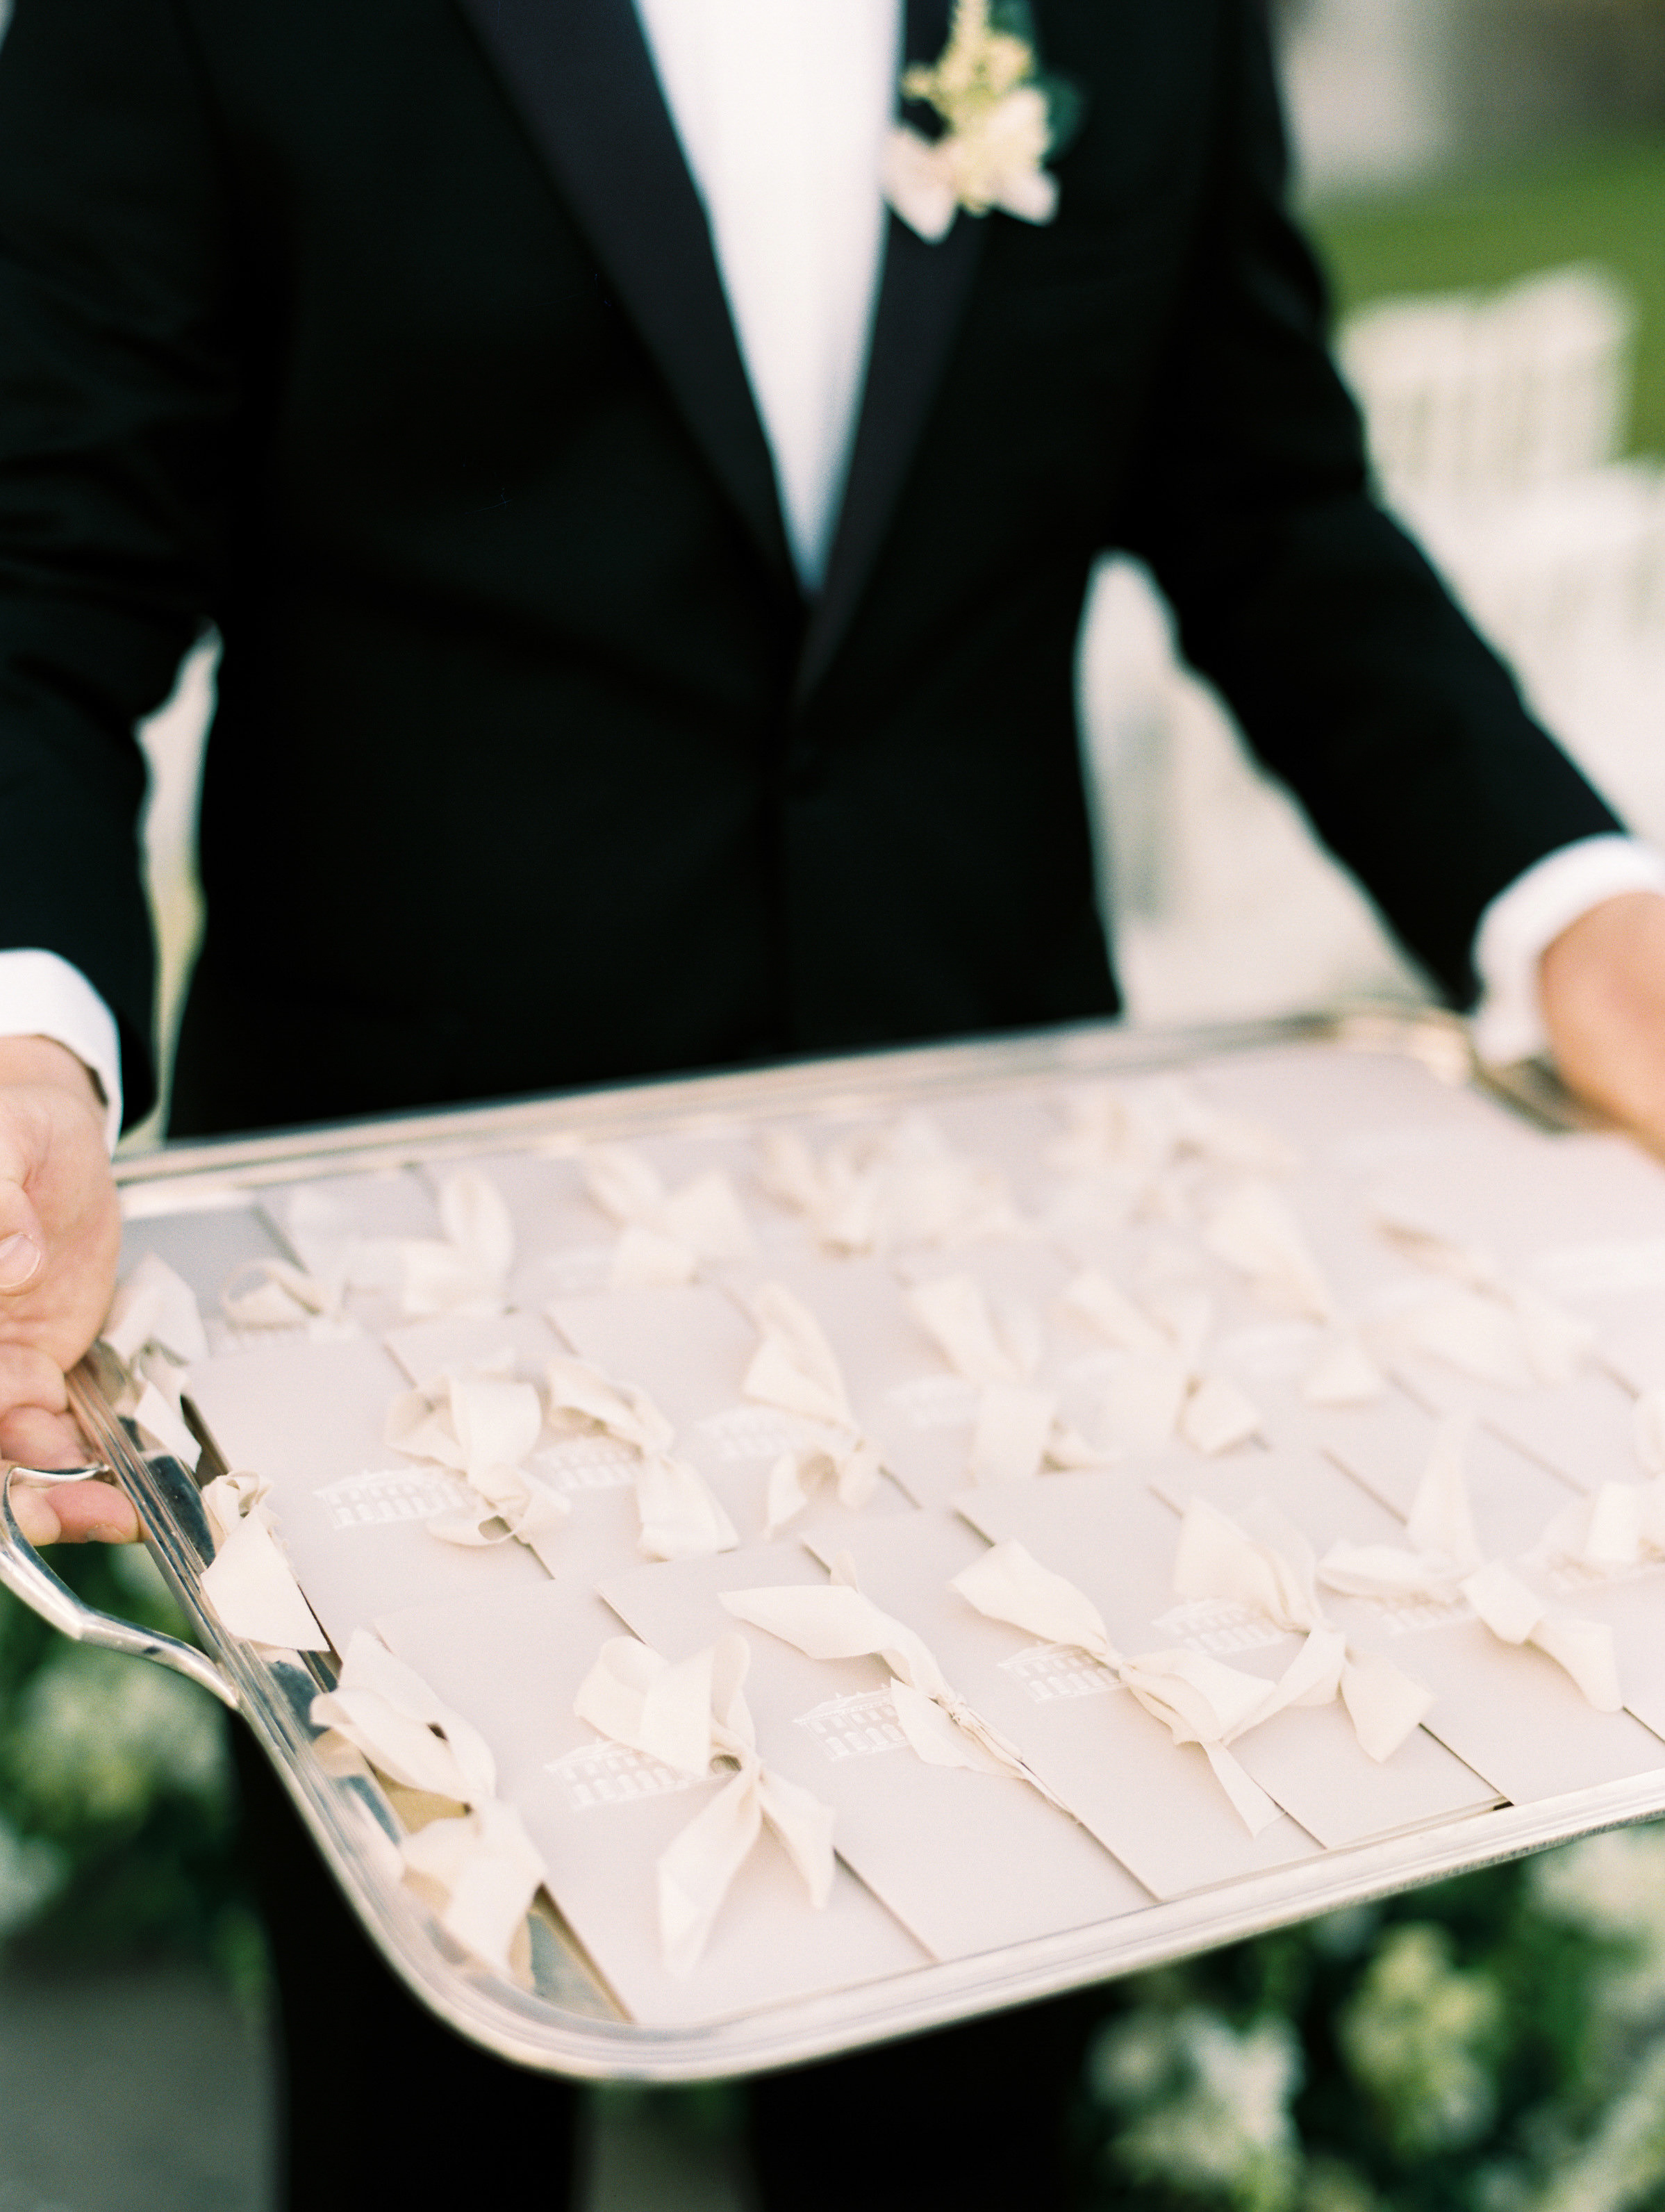 ramsey charles ireland wedding programs on tray